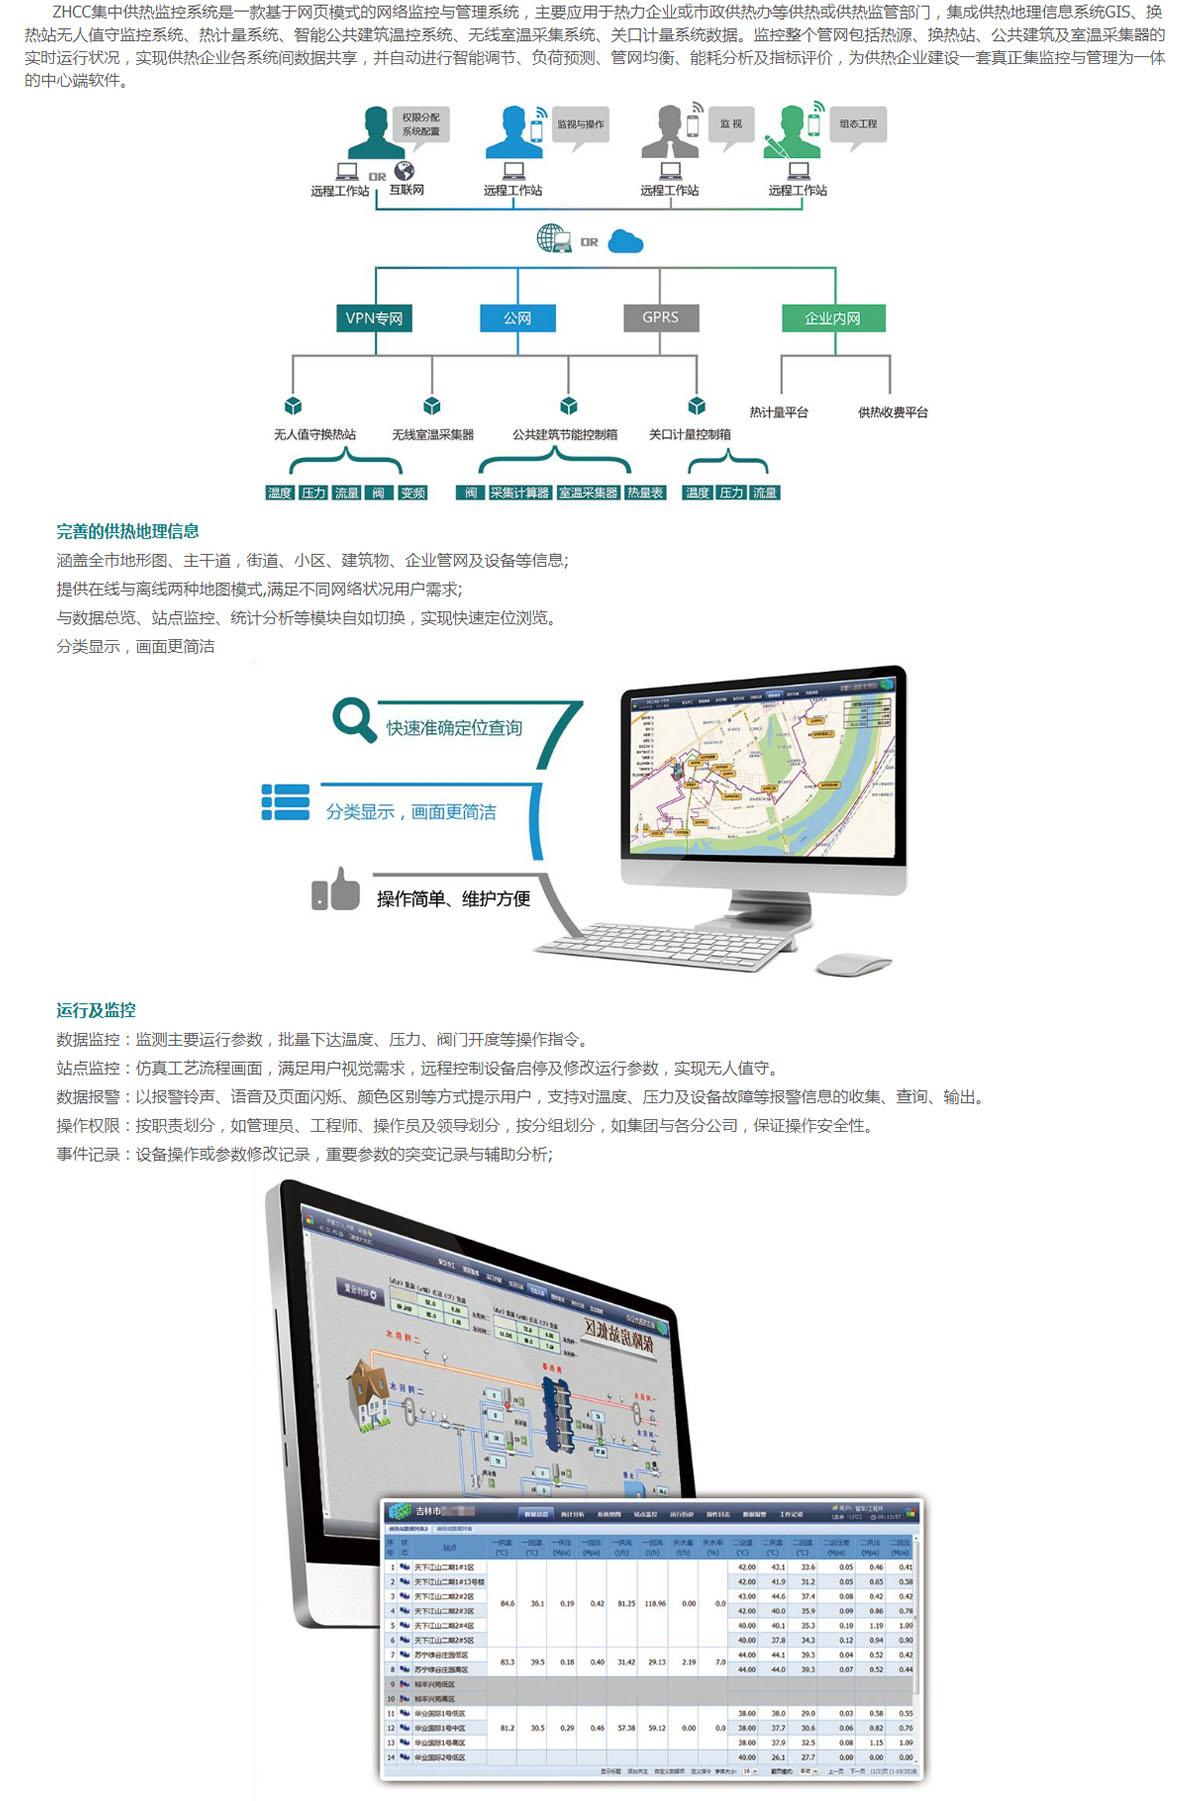 ZHCC集中供热监控系统1.jpg